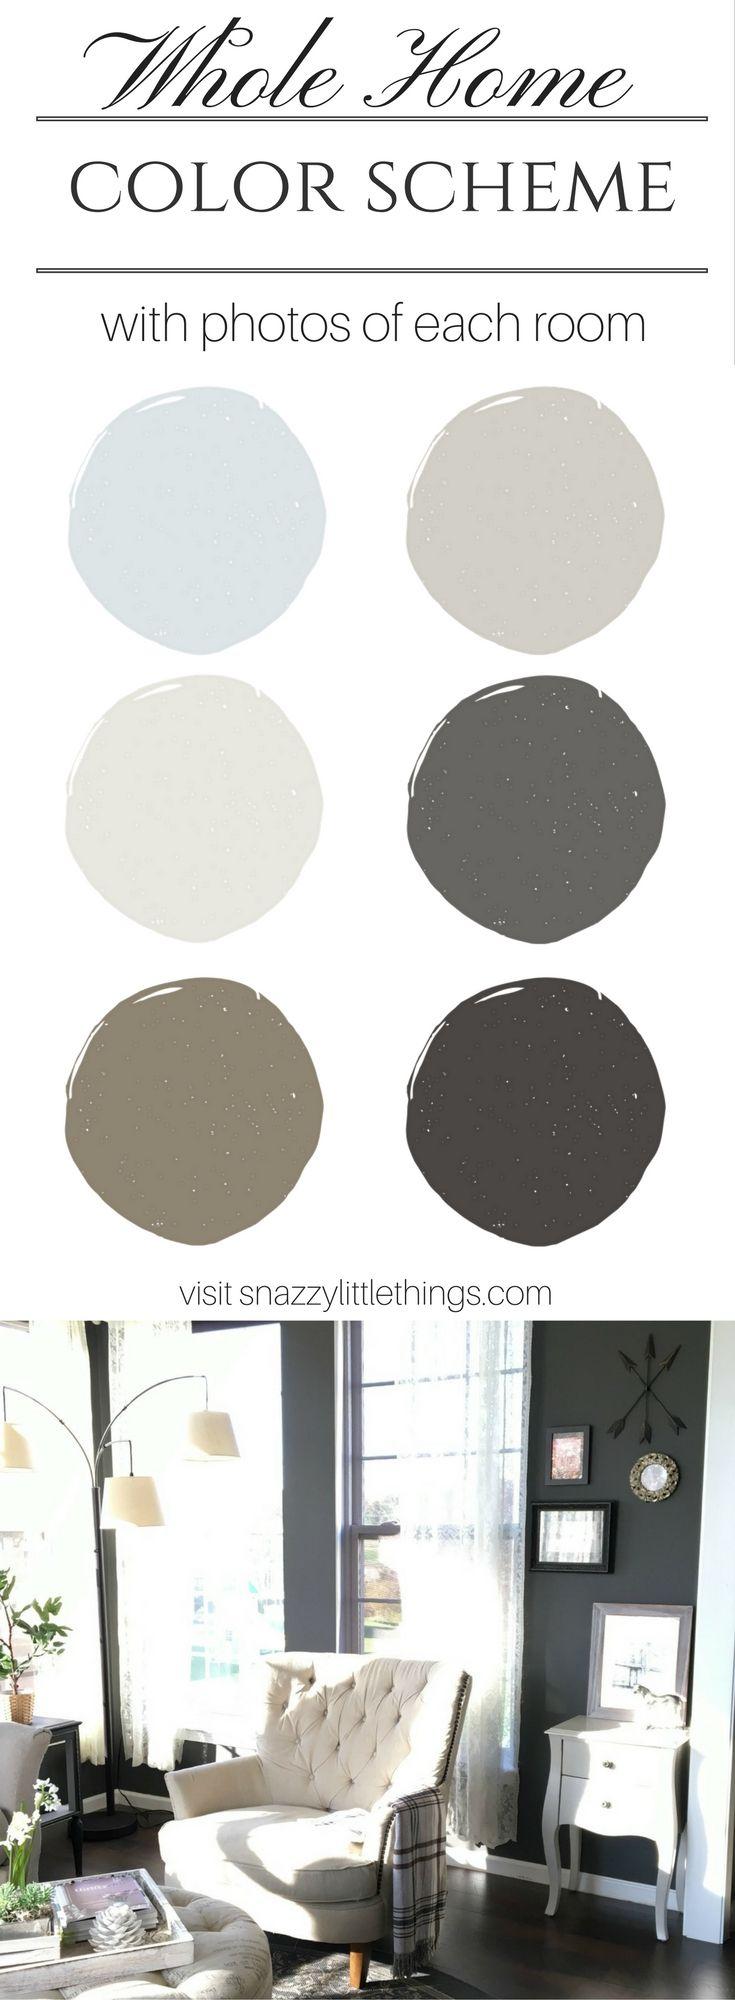 Best Ideas About Home Color Schemes On Pinterest Interior - Color scheme designer home